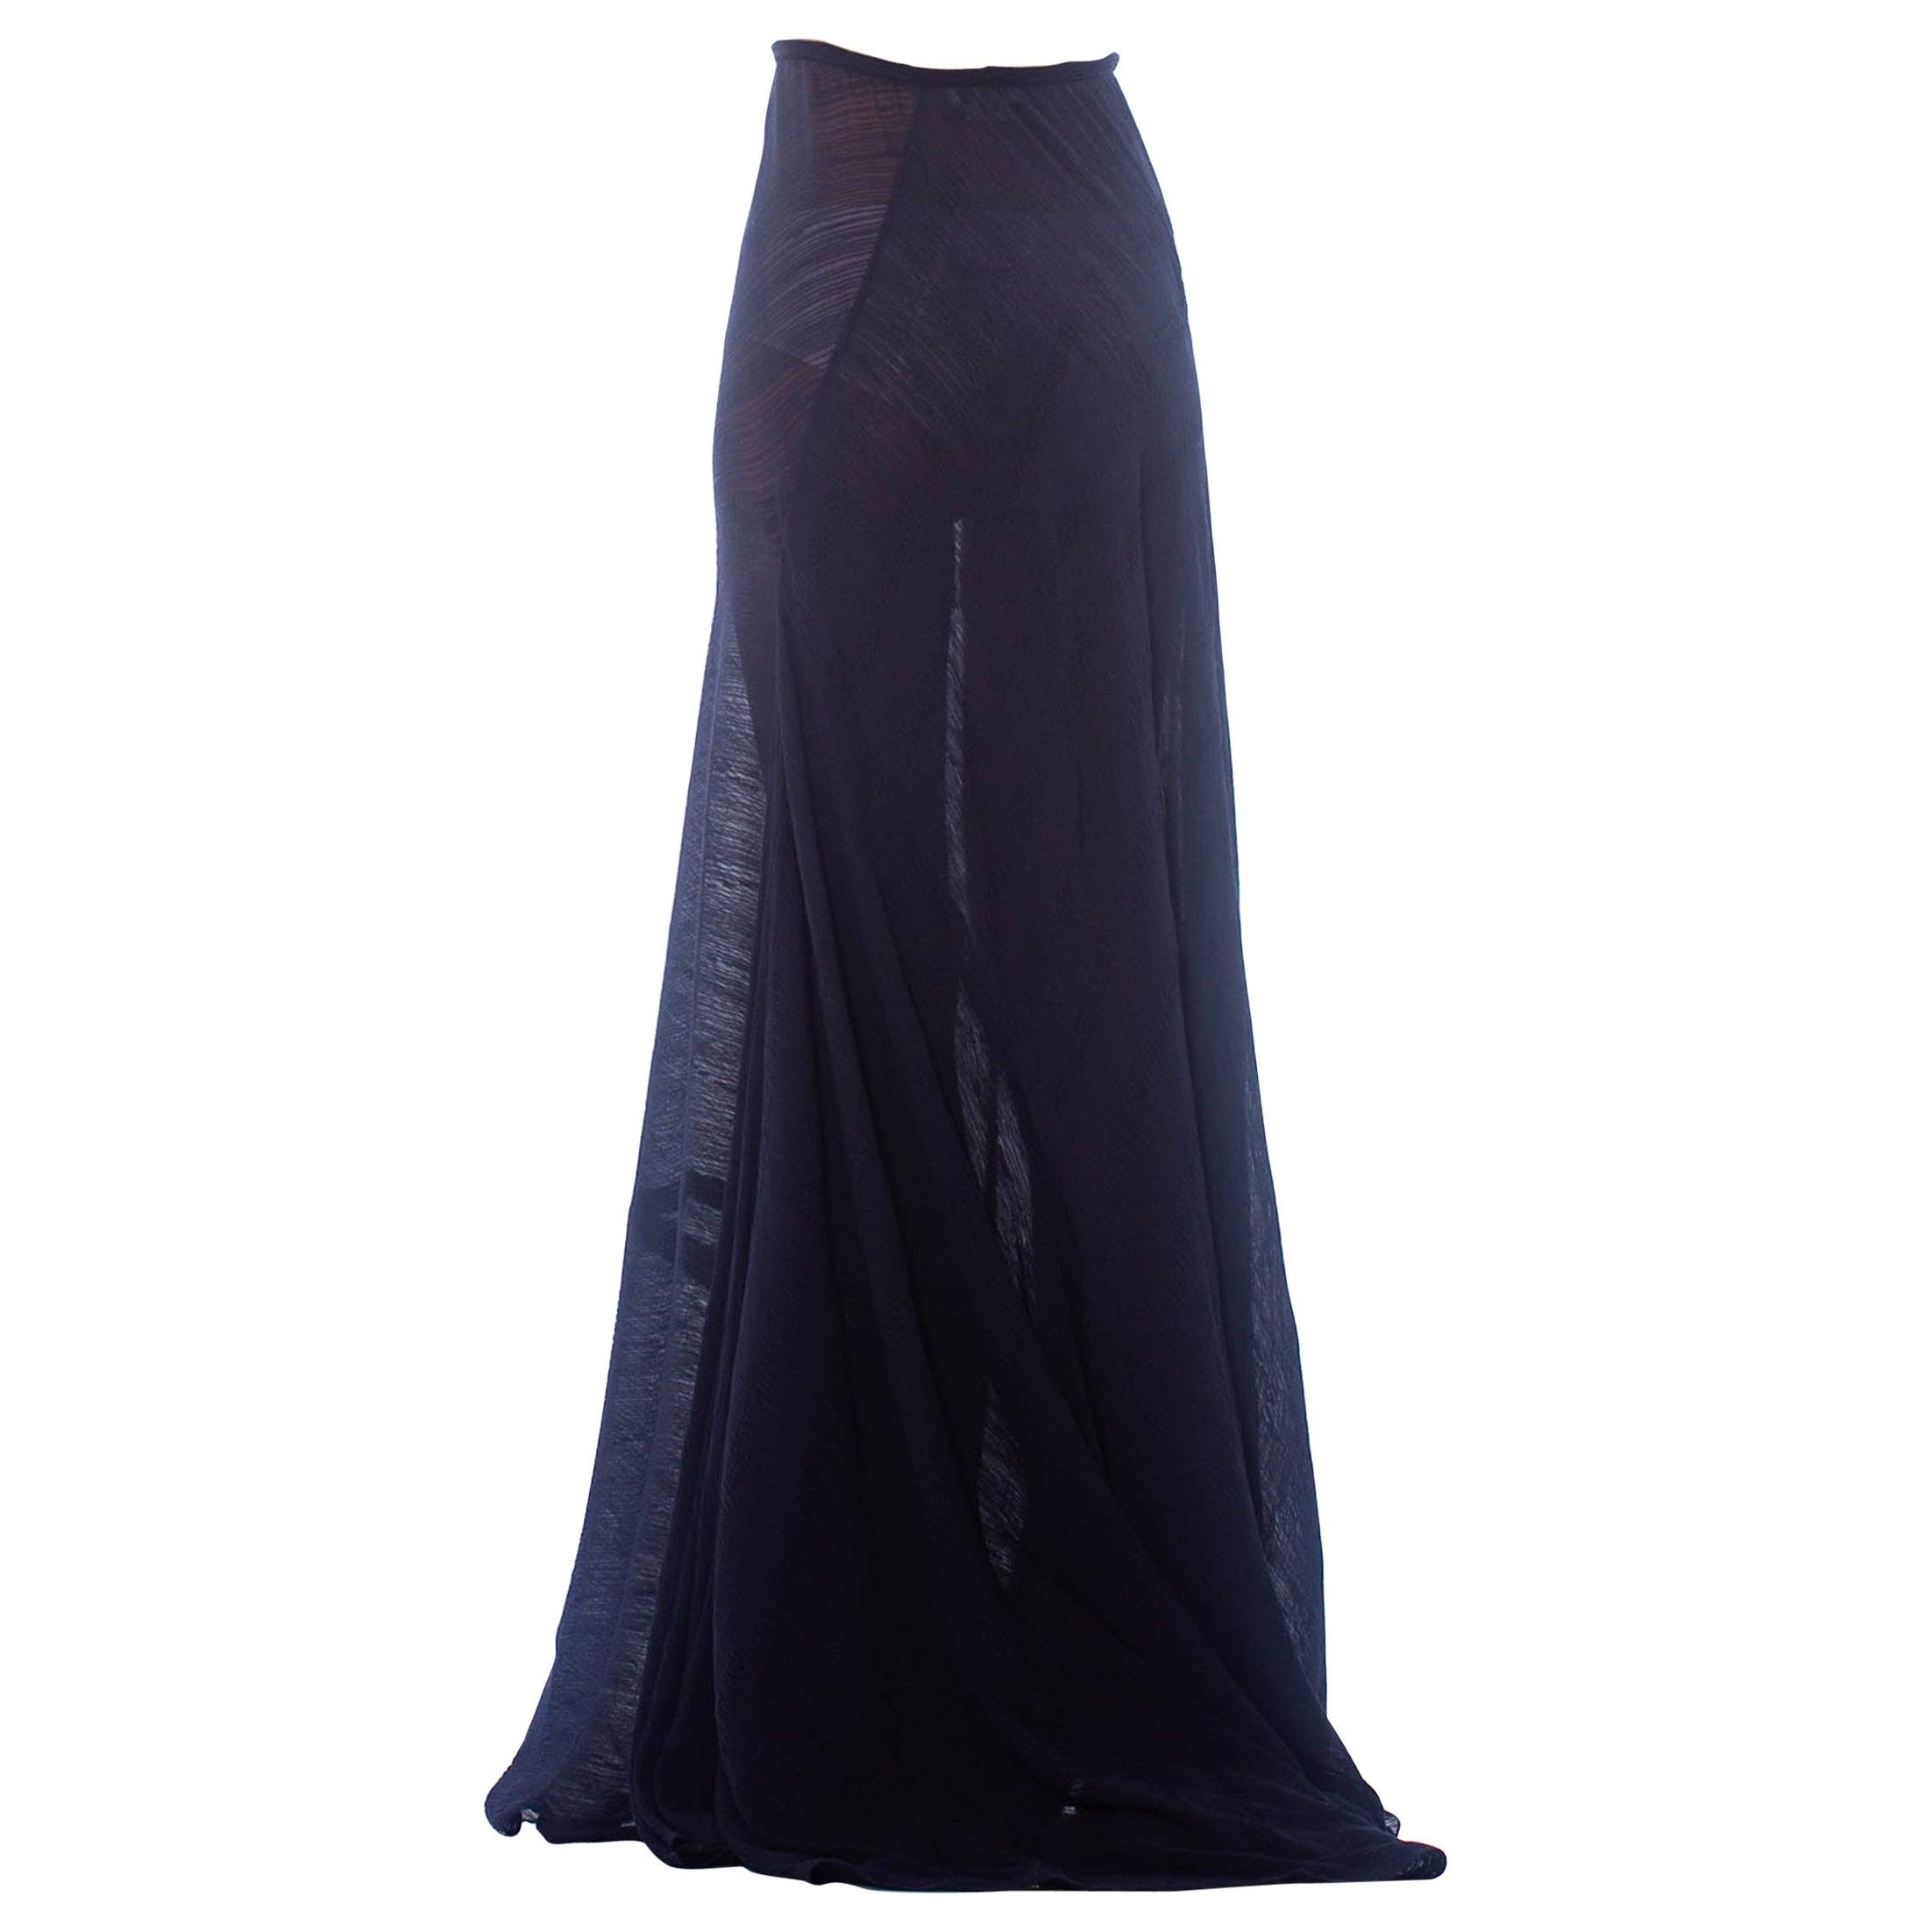 2000S CALVIN KLEIN Navy Blue Sheer Silk Textured Chiffon Bias & Trained Skirt